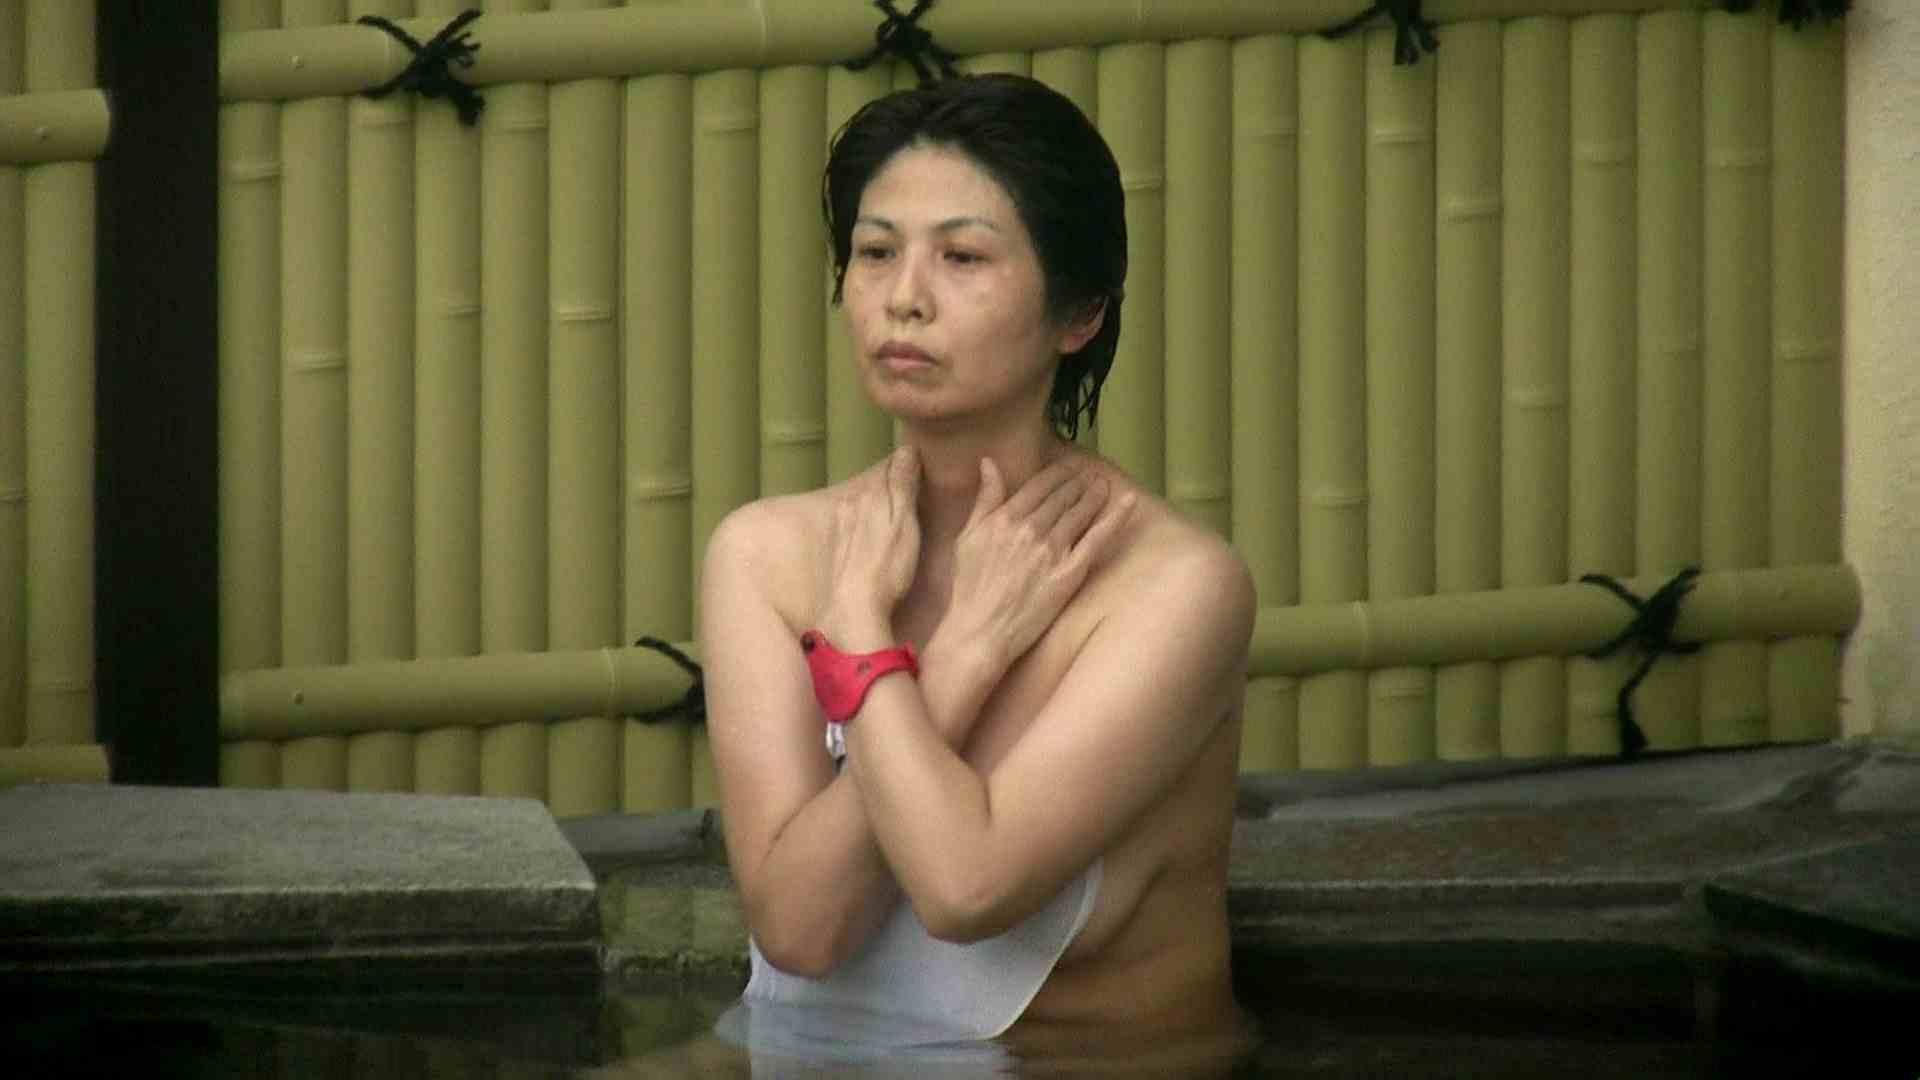 Aquaな露天風呂Vol.636 HなOL | 盗撮  82pic 42